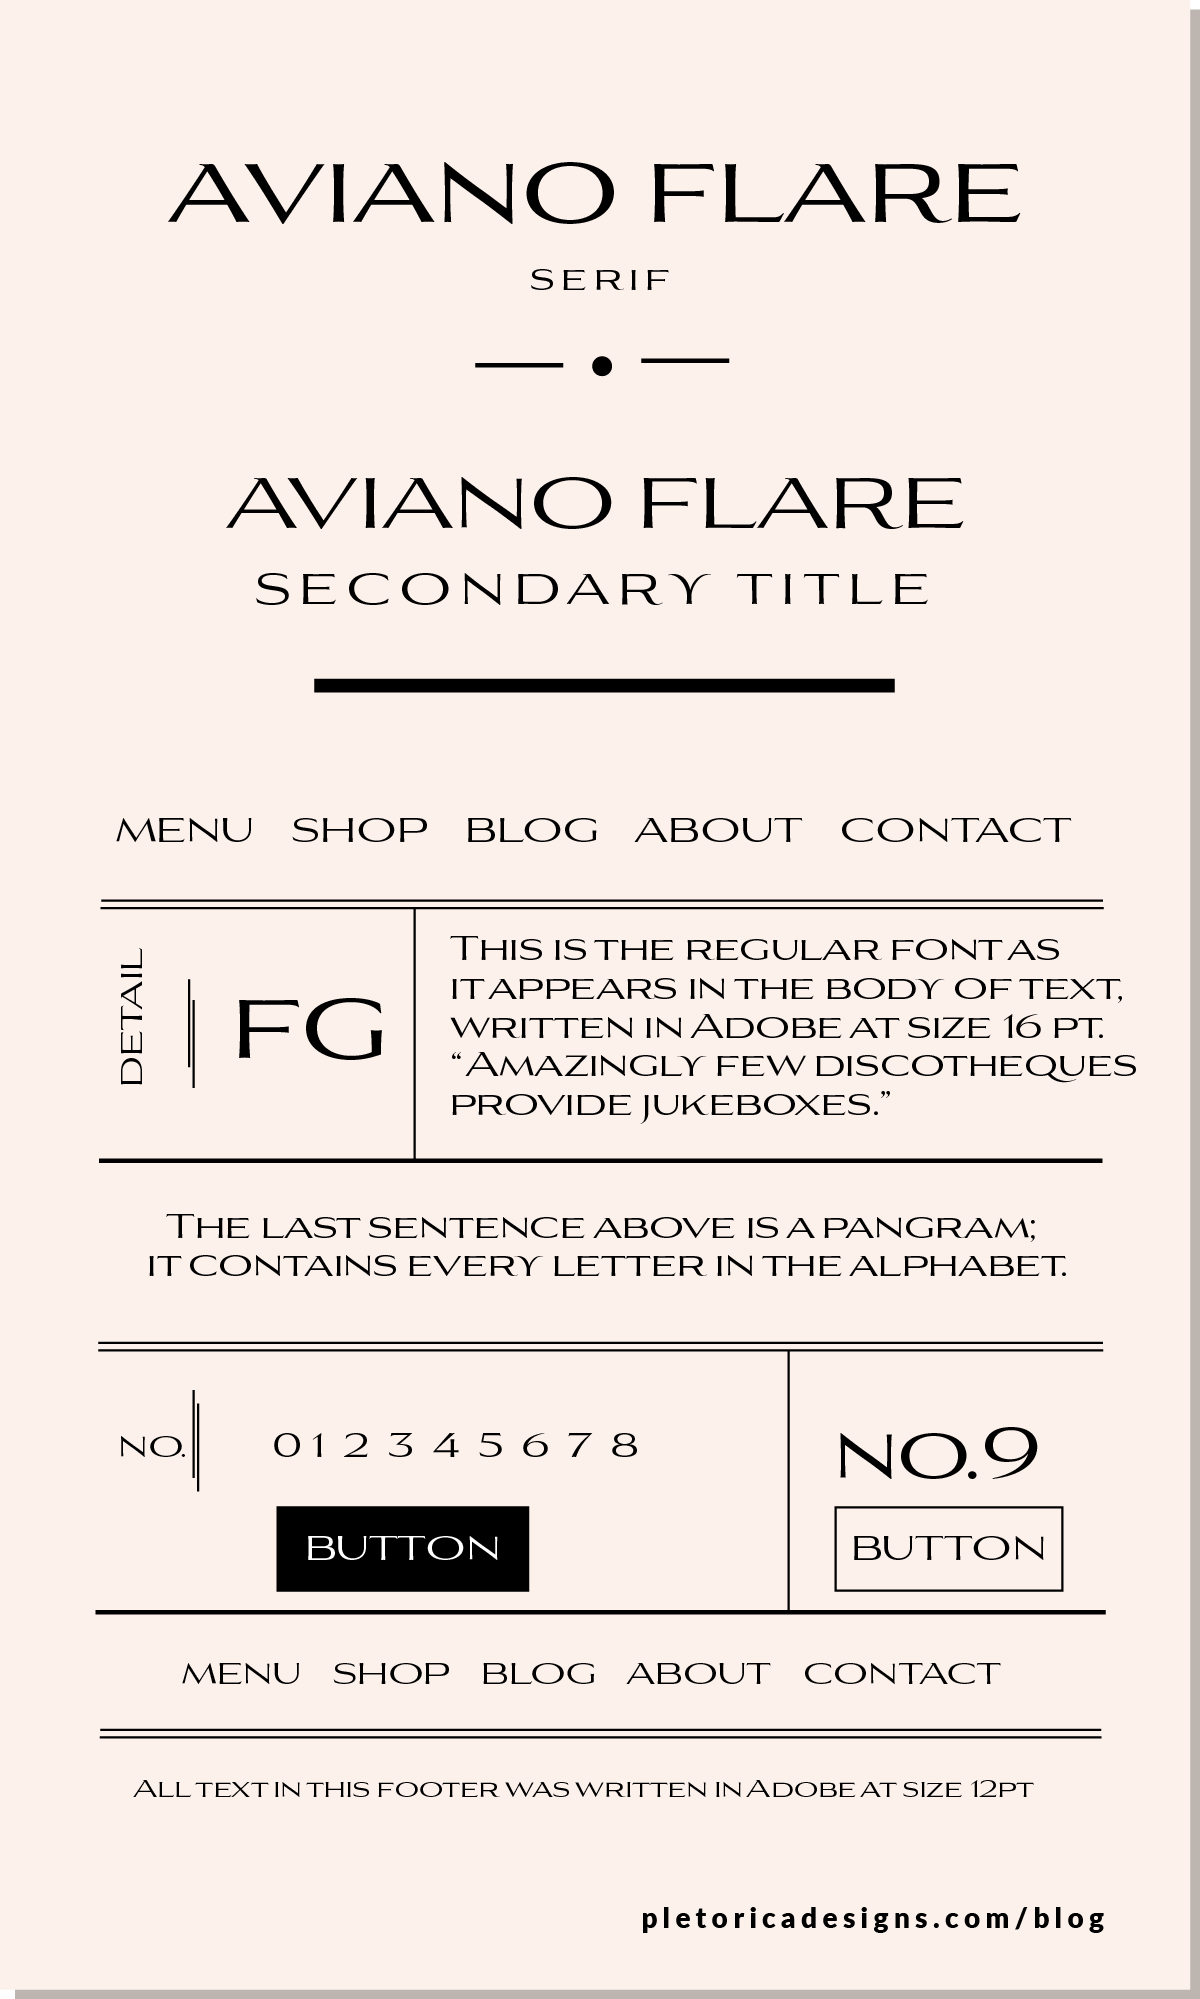 LET'S TYPE - Aviano Flare — PLETÓRICA DESIGNS